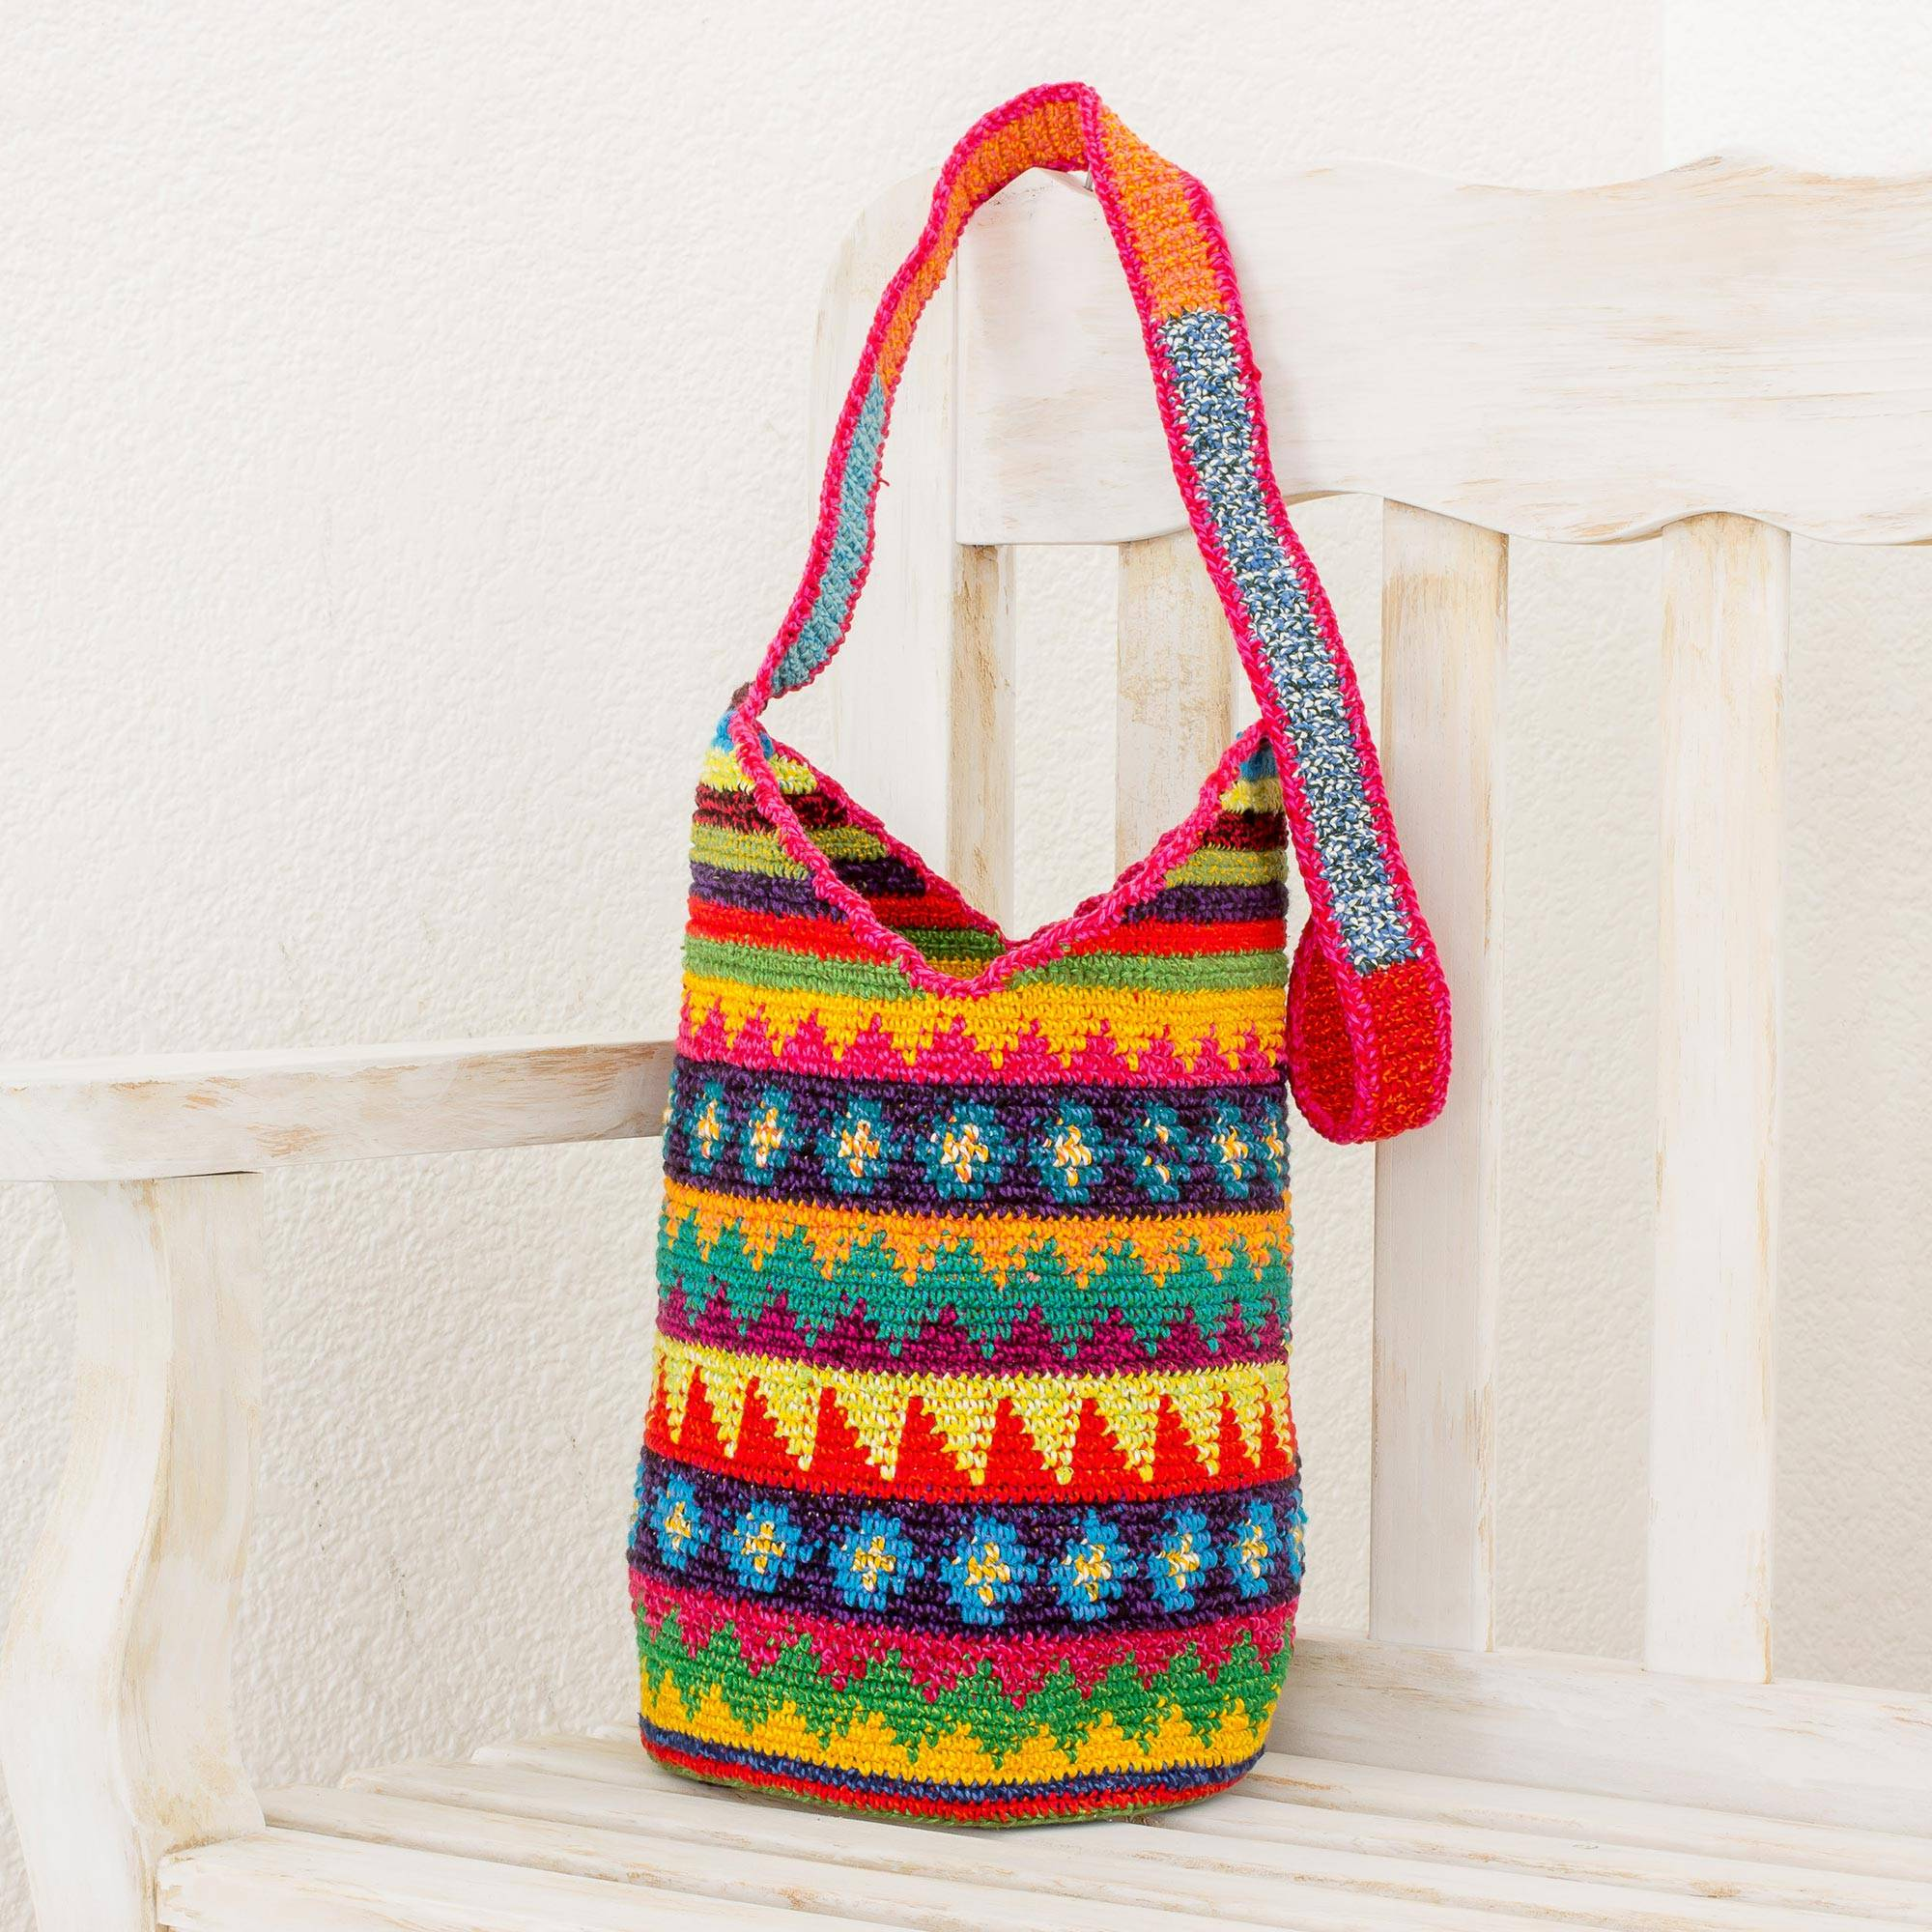 Crocheted Geometric Motif Cotton Bucket Bag From Guatemala